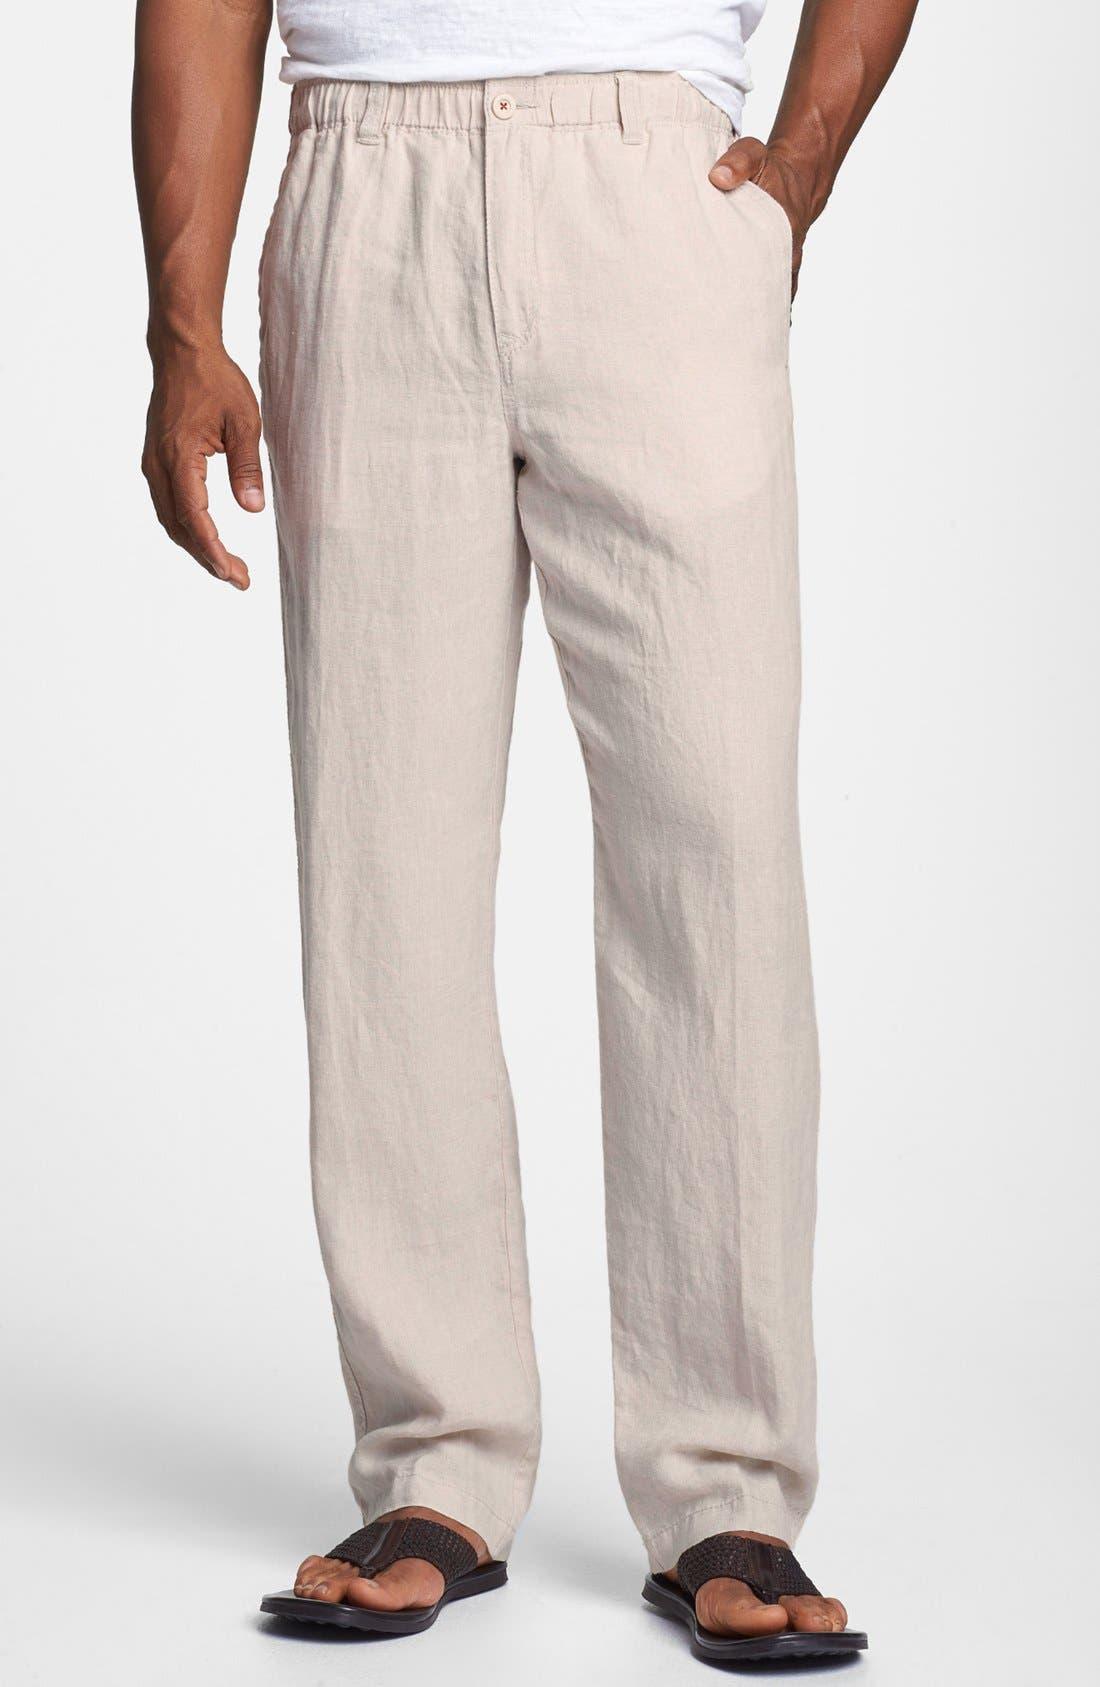 New Linen on the Beach Linen Pants,                         Main,                         color, Natural Linen